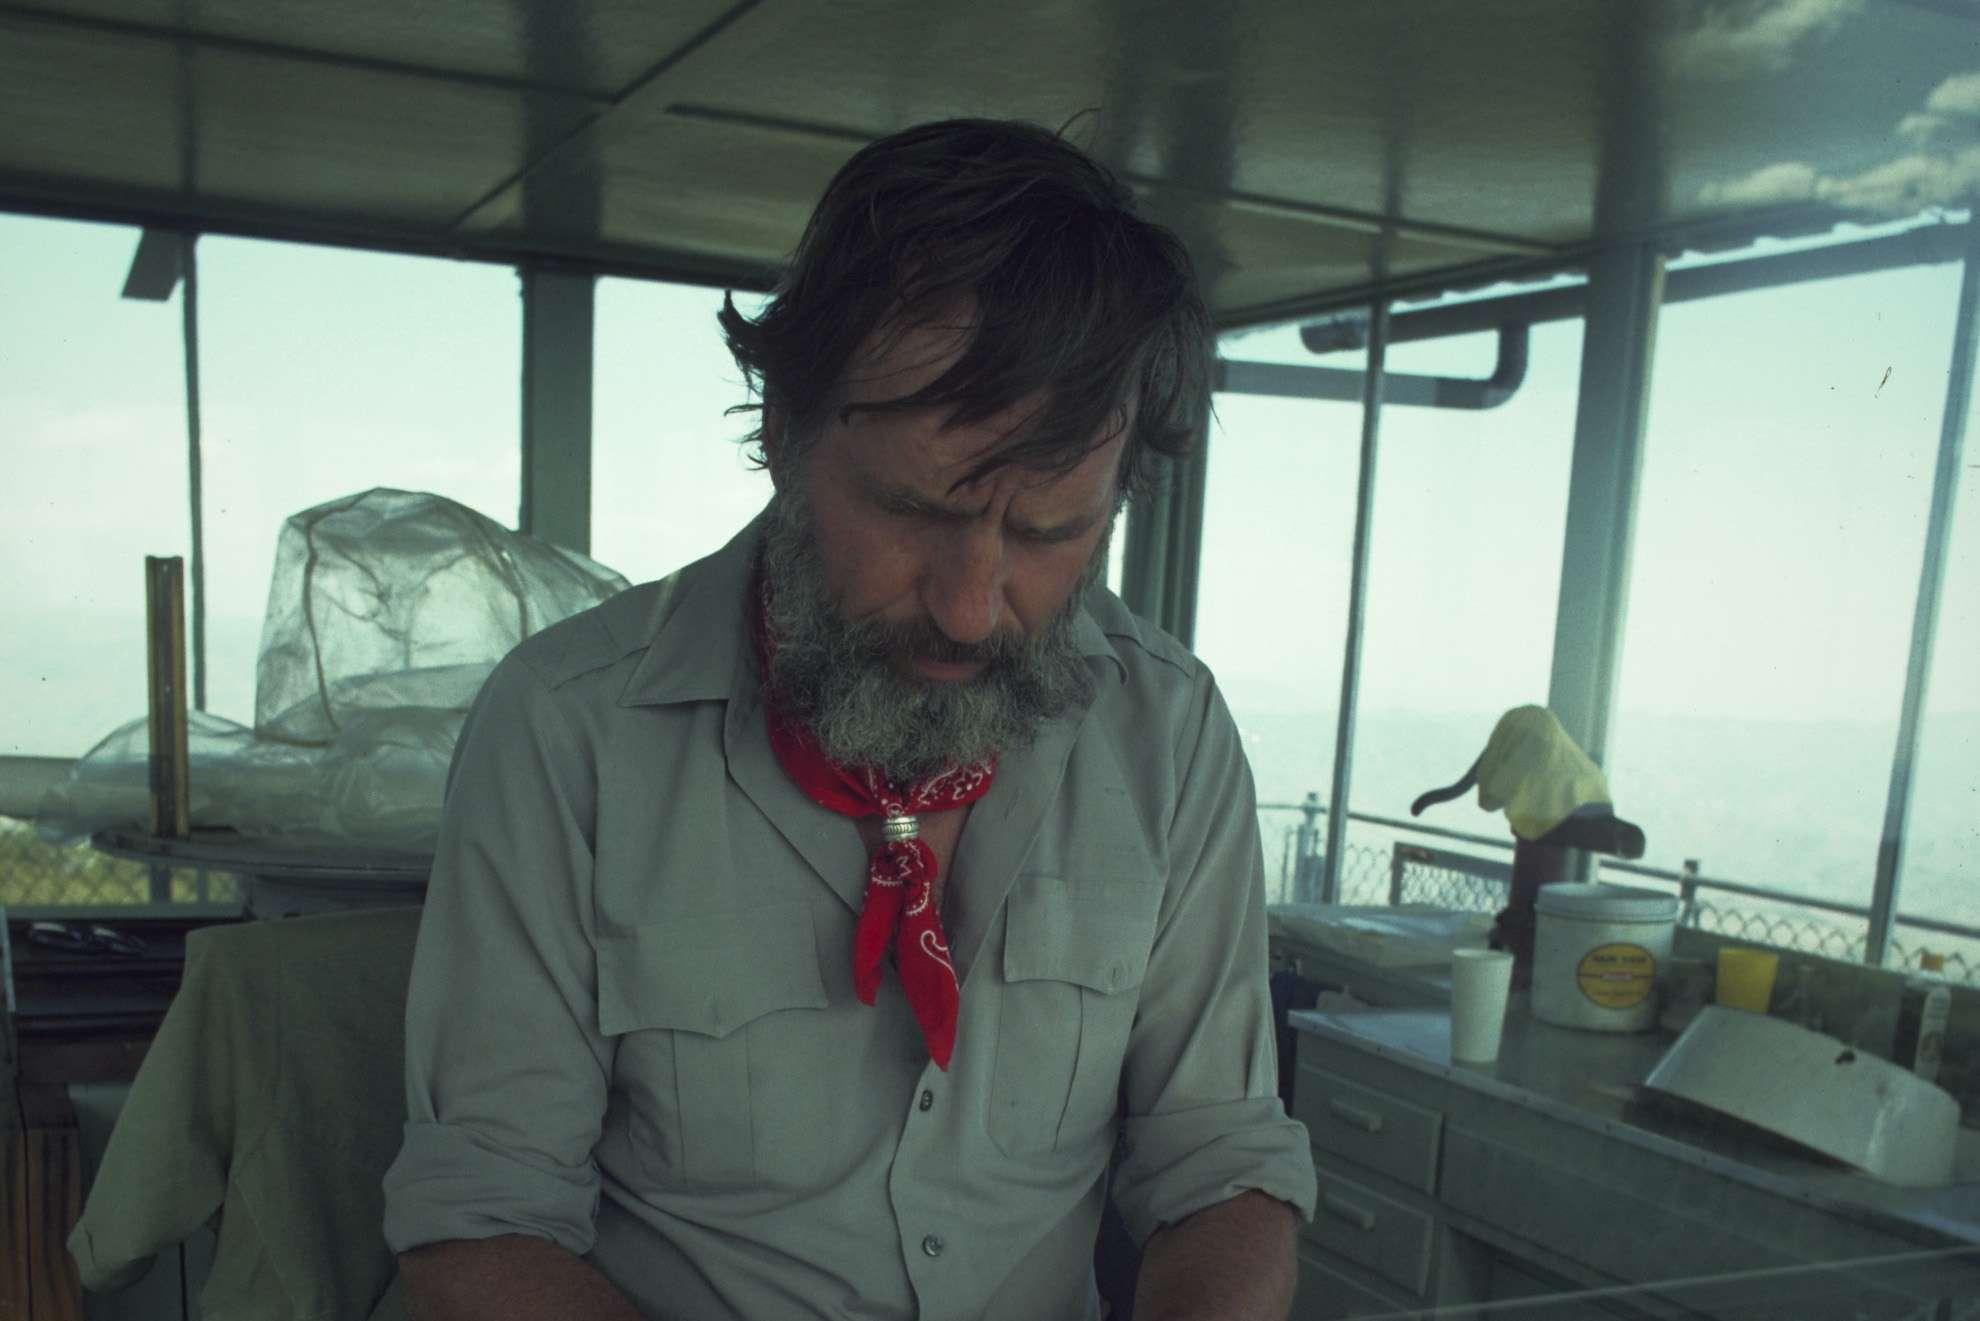 Novelist Edward Abbey at work on a boat